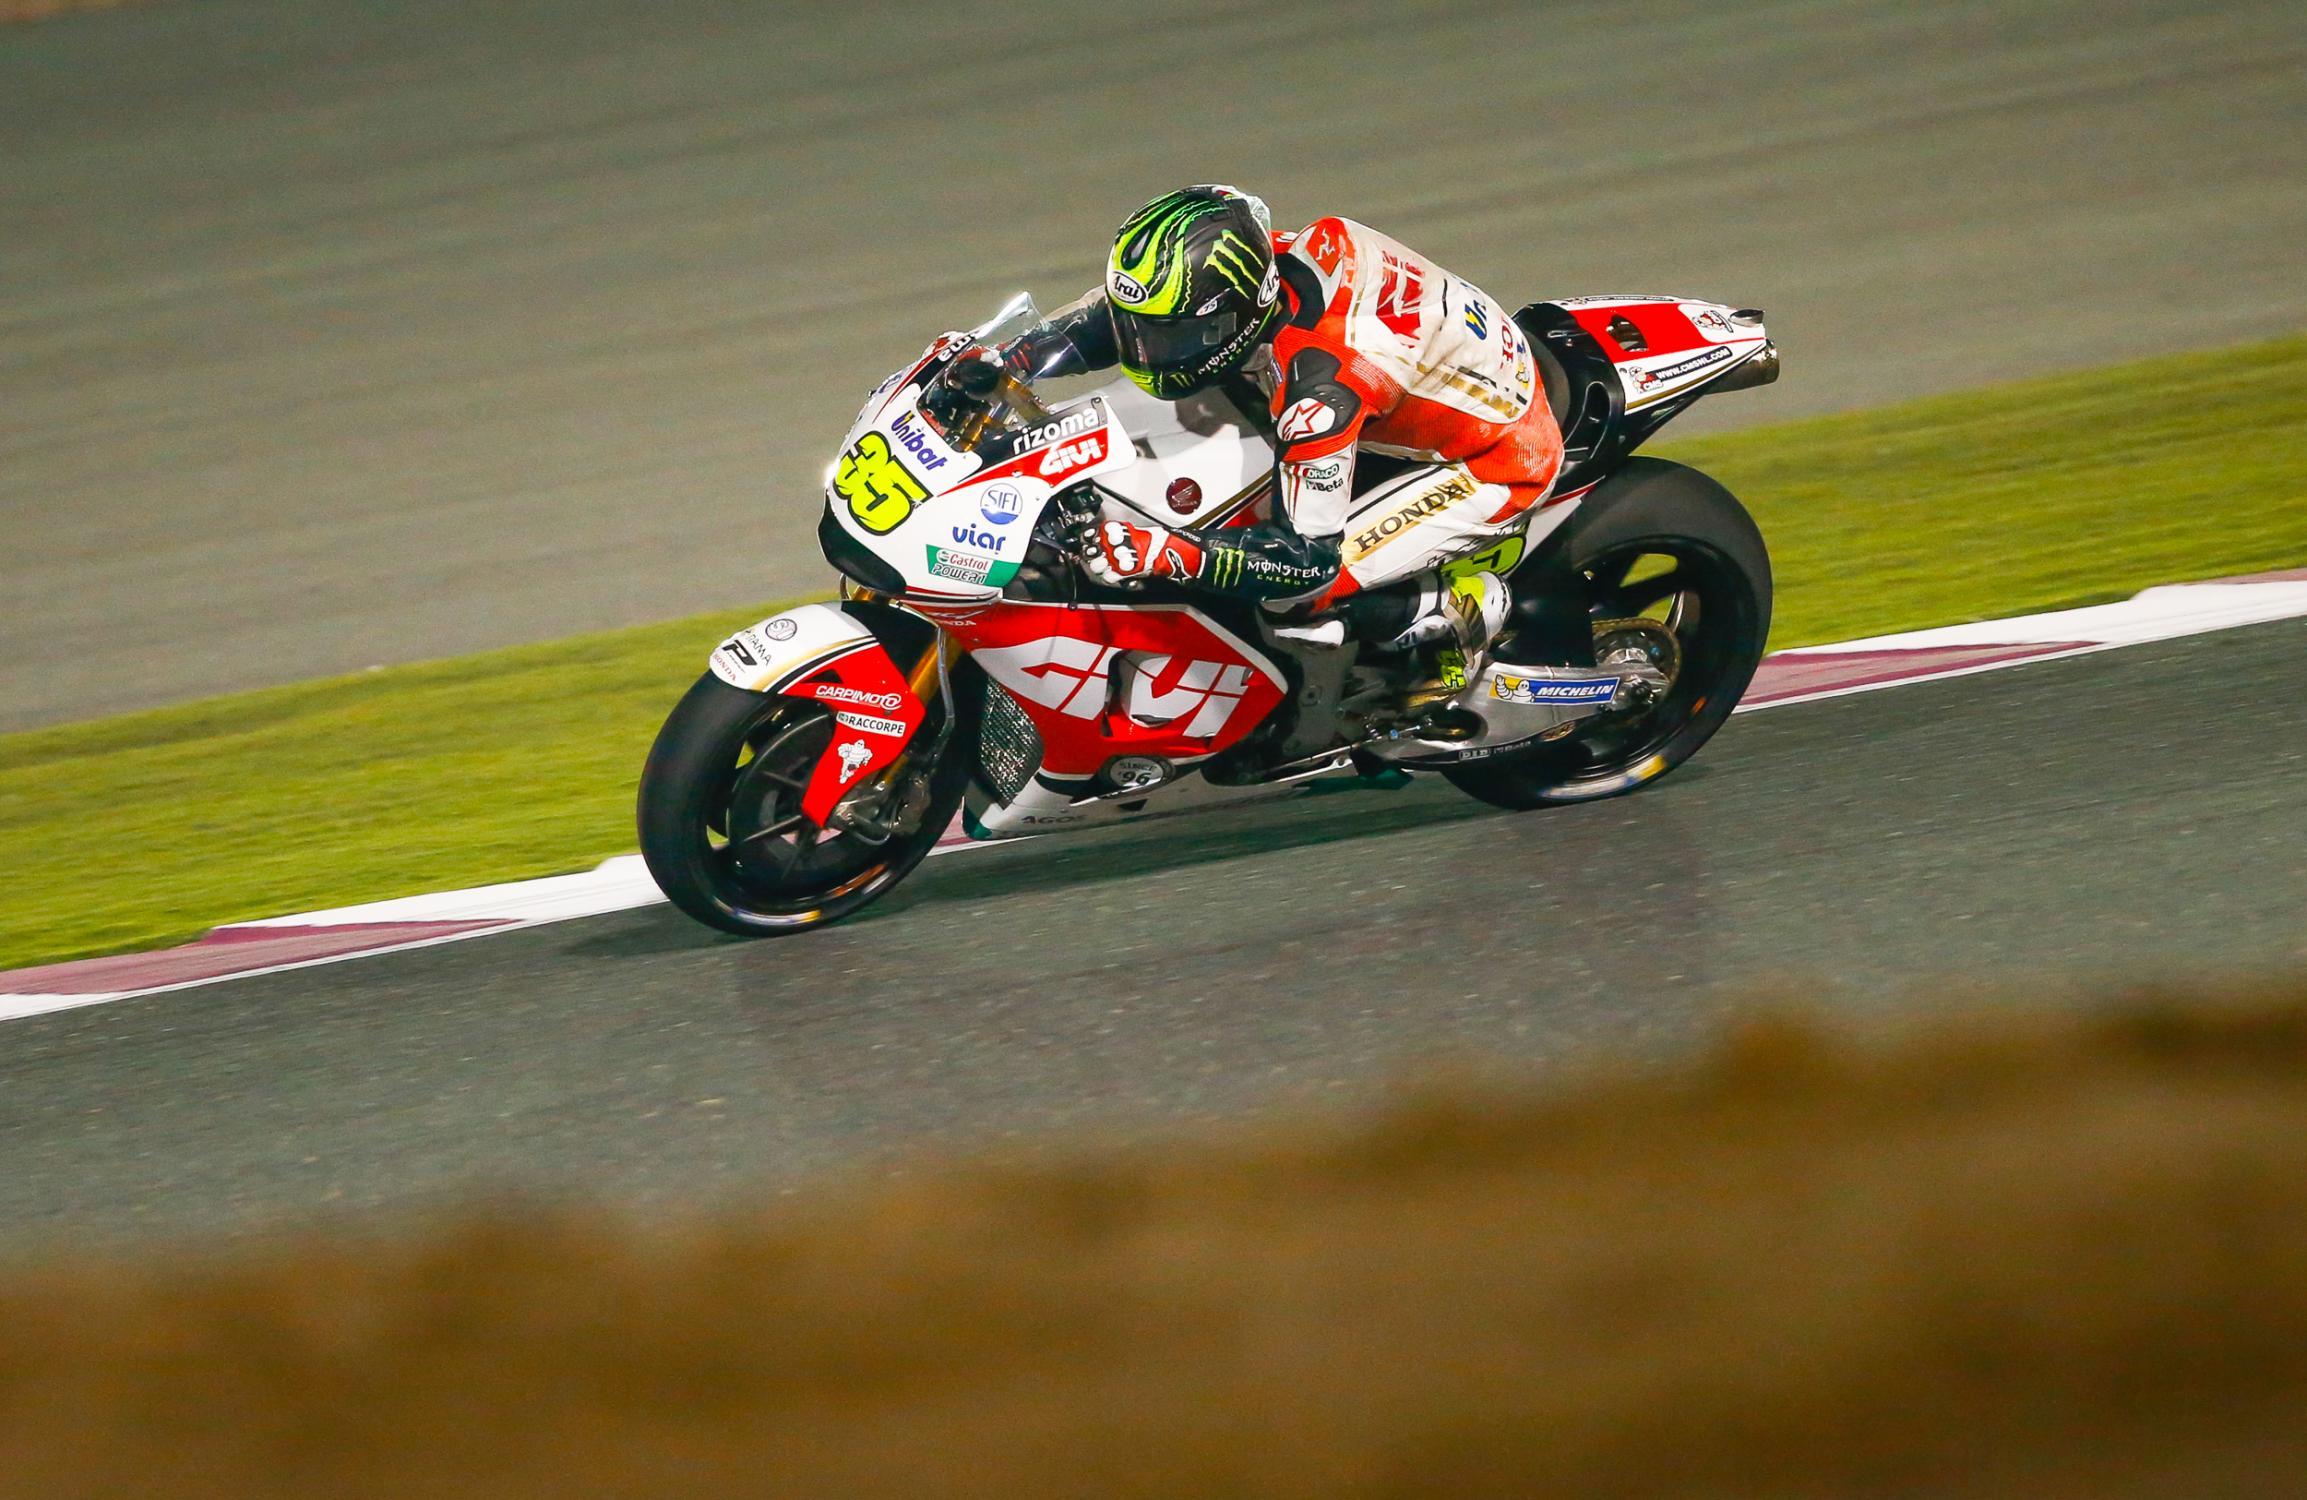 Test MotoGP Qatar 2016 35-crutchlow_gp_6155.gallery_full_top_fullscreen